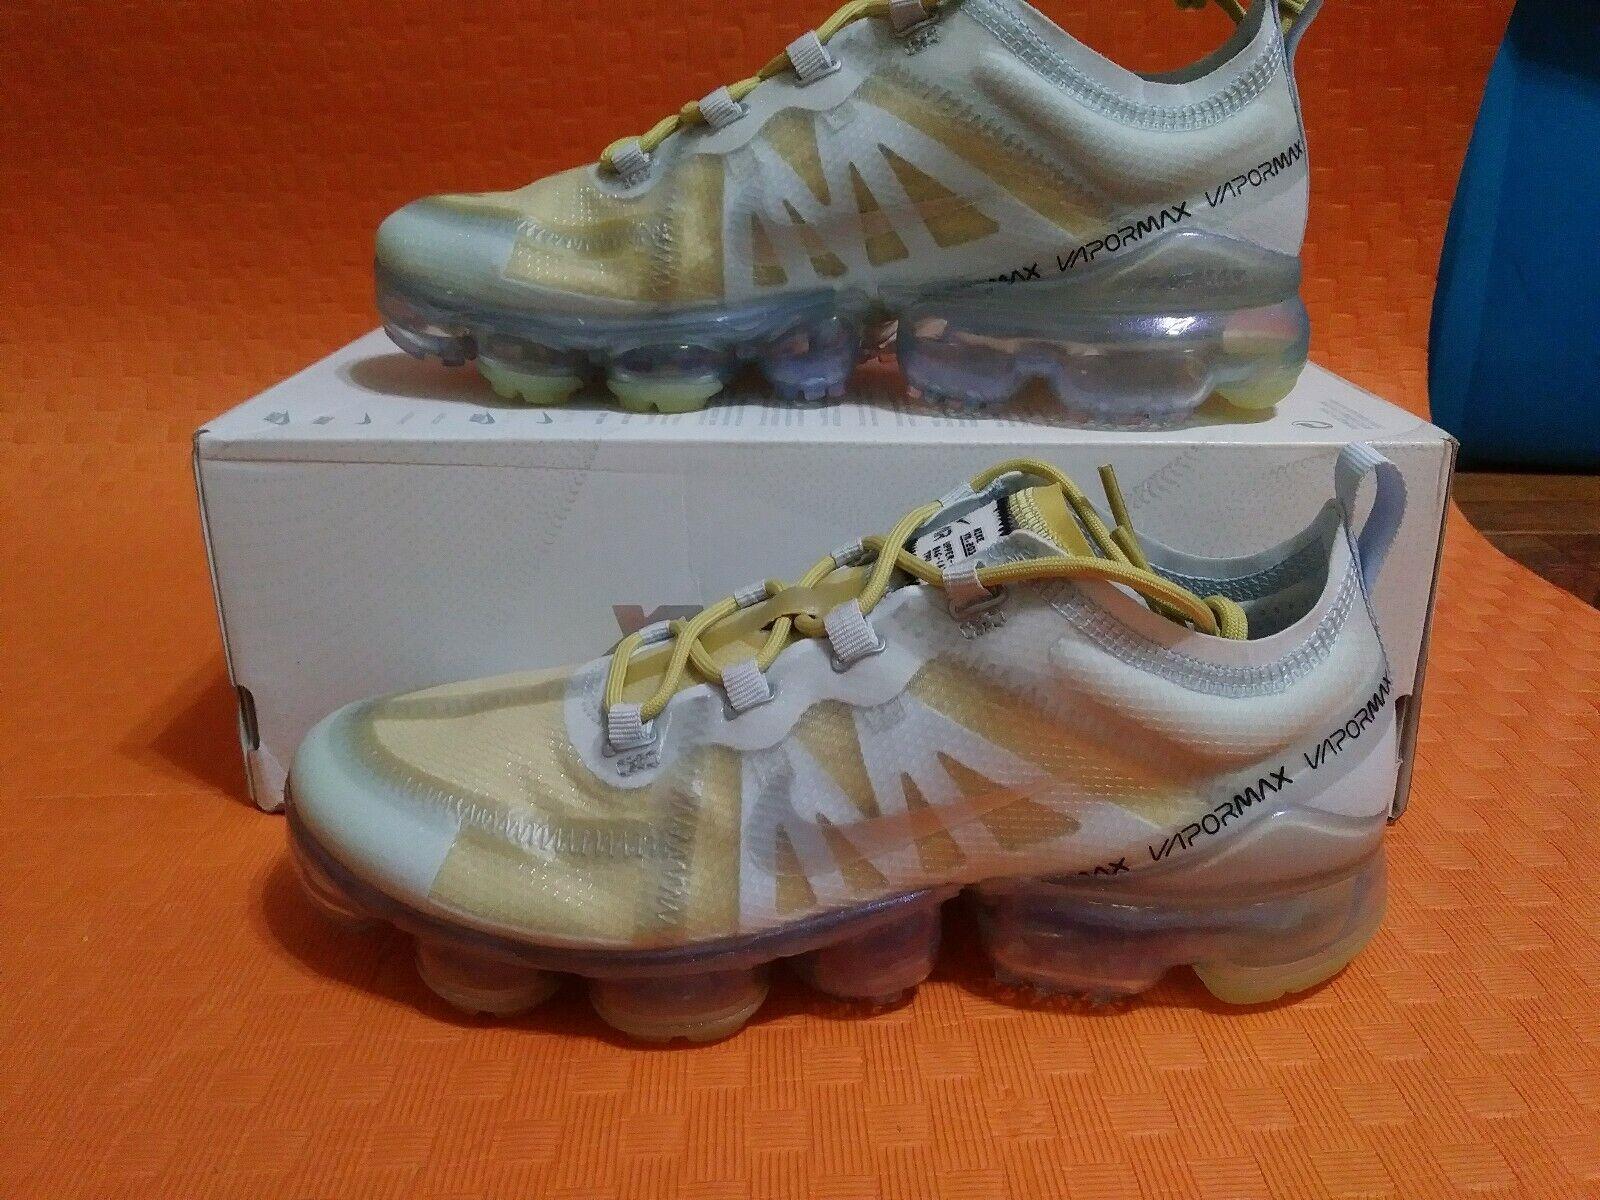 Nike Air Vapormax 2019 Premium Women's Running shoes, AT6817 302 Sz8.5no top box